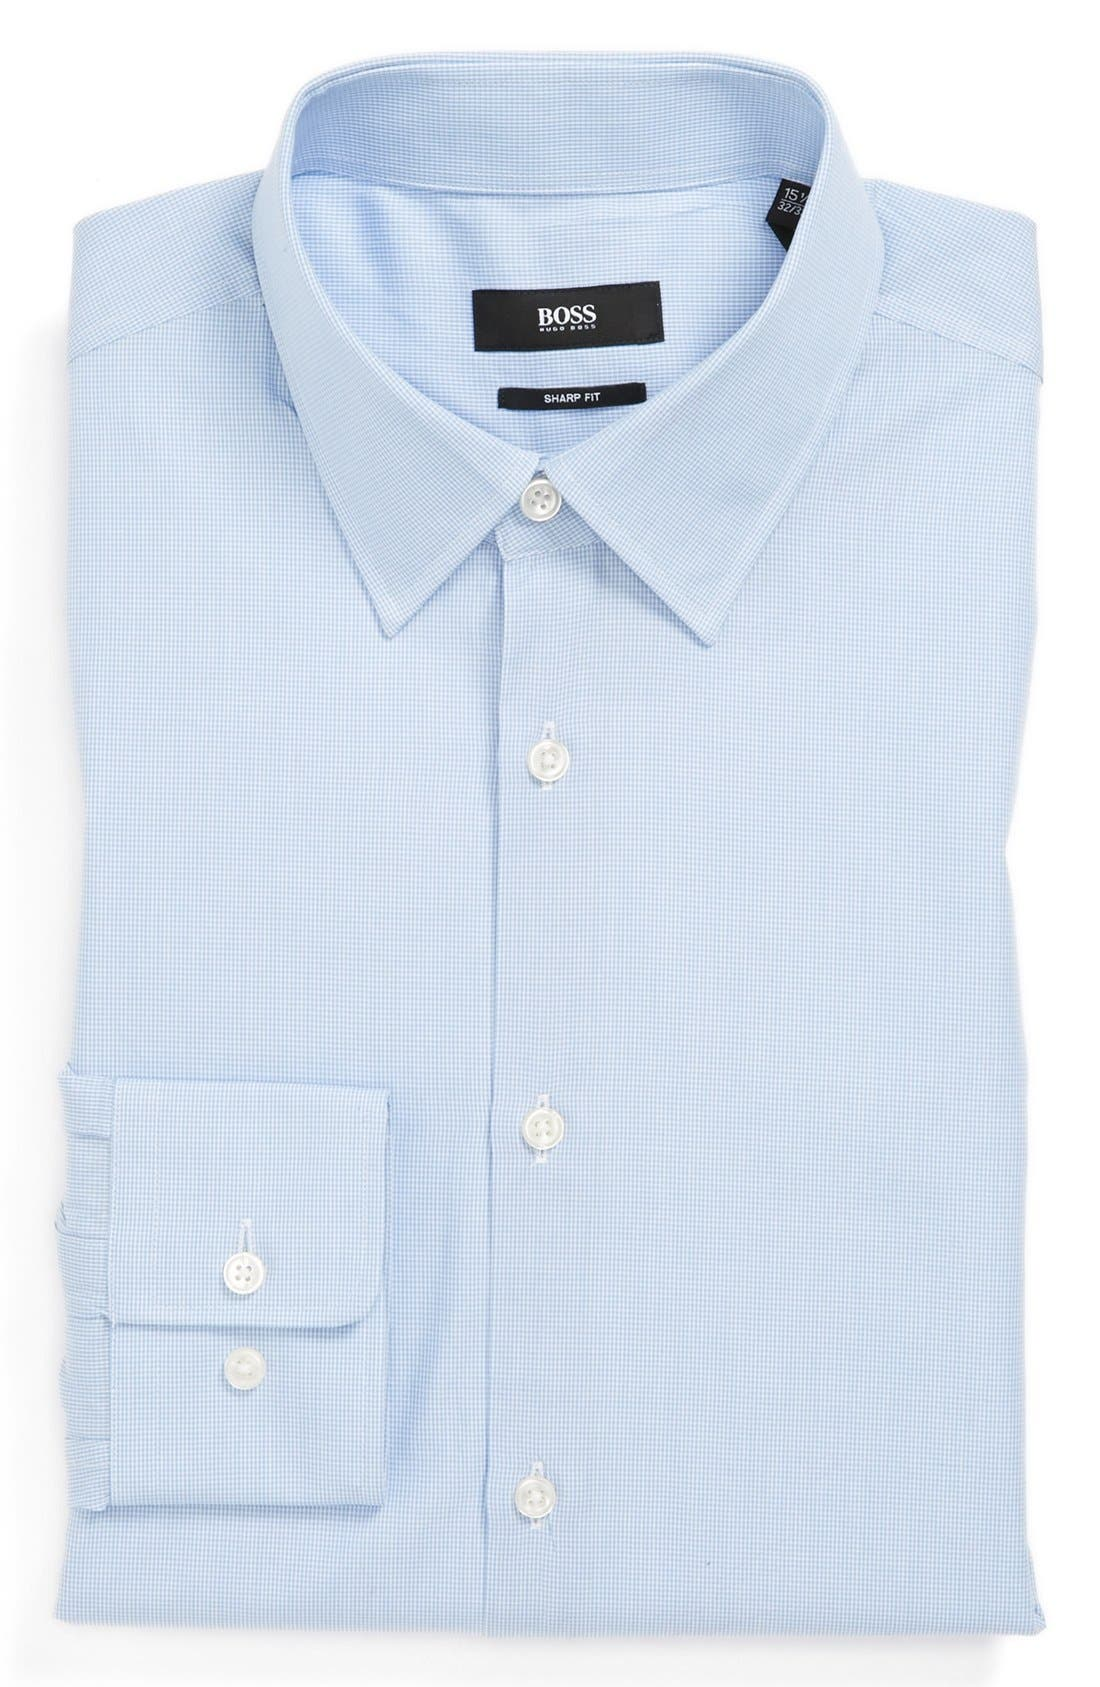 Alternate Image 1 Selected - BOSS 'Marlow' Sharp Fit Dress Shirt